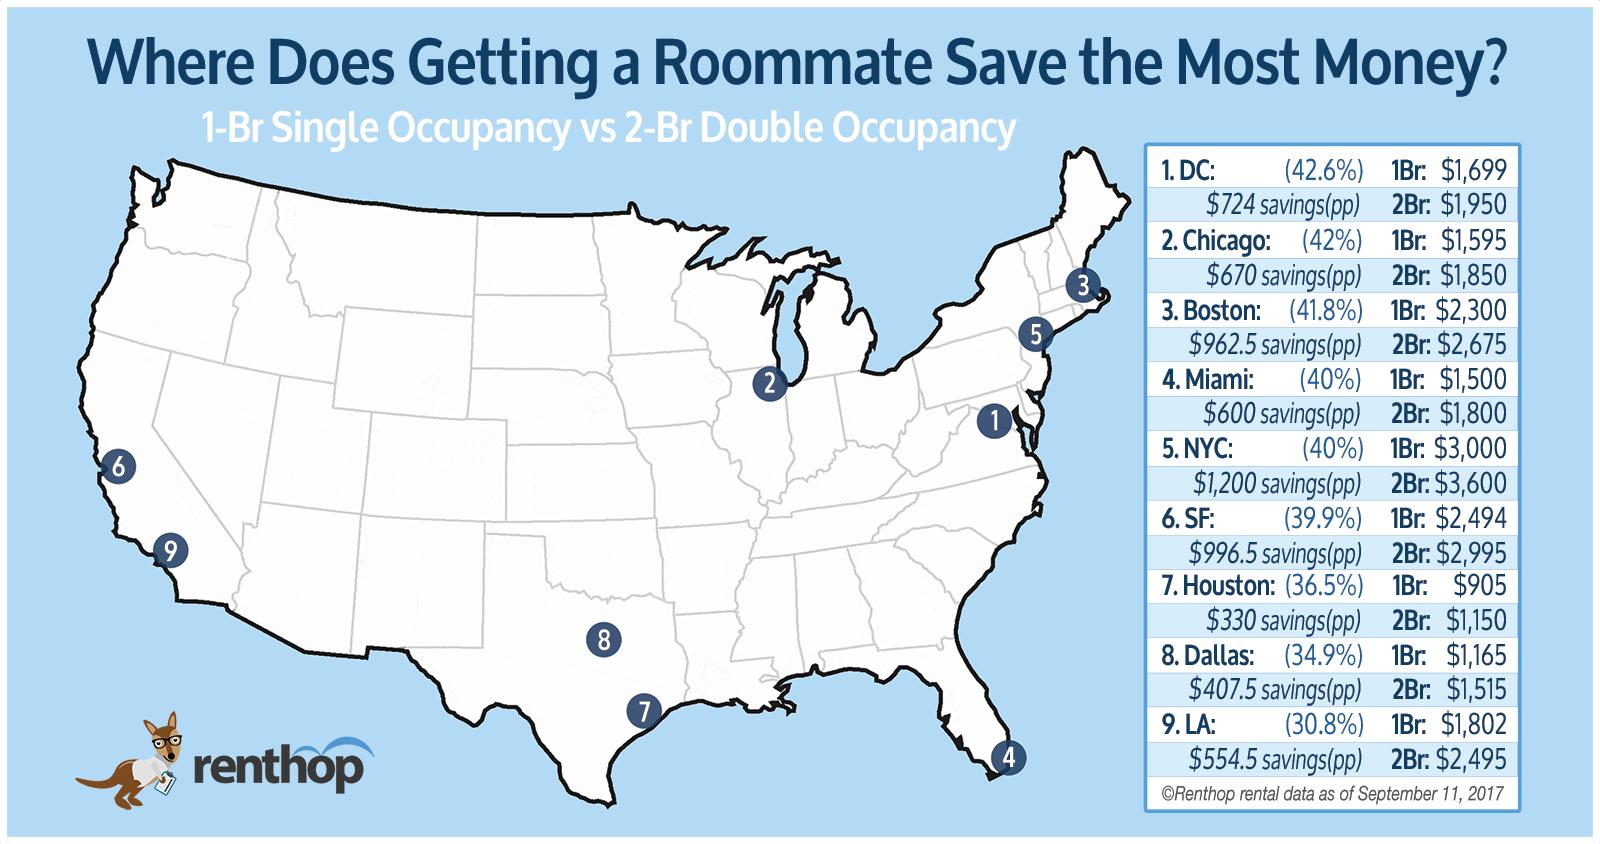 National Roommate Savings Map